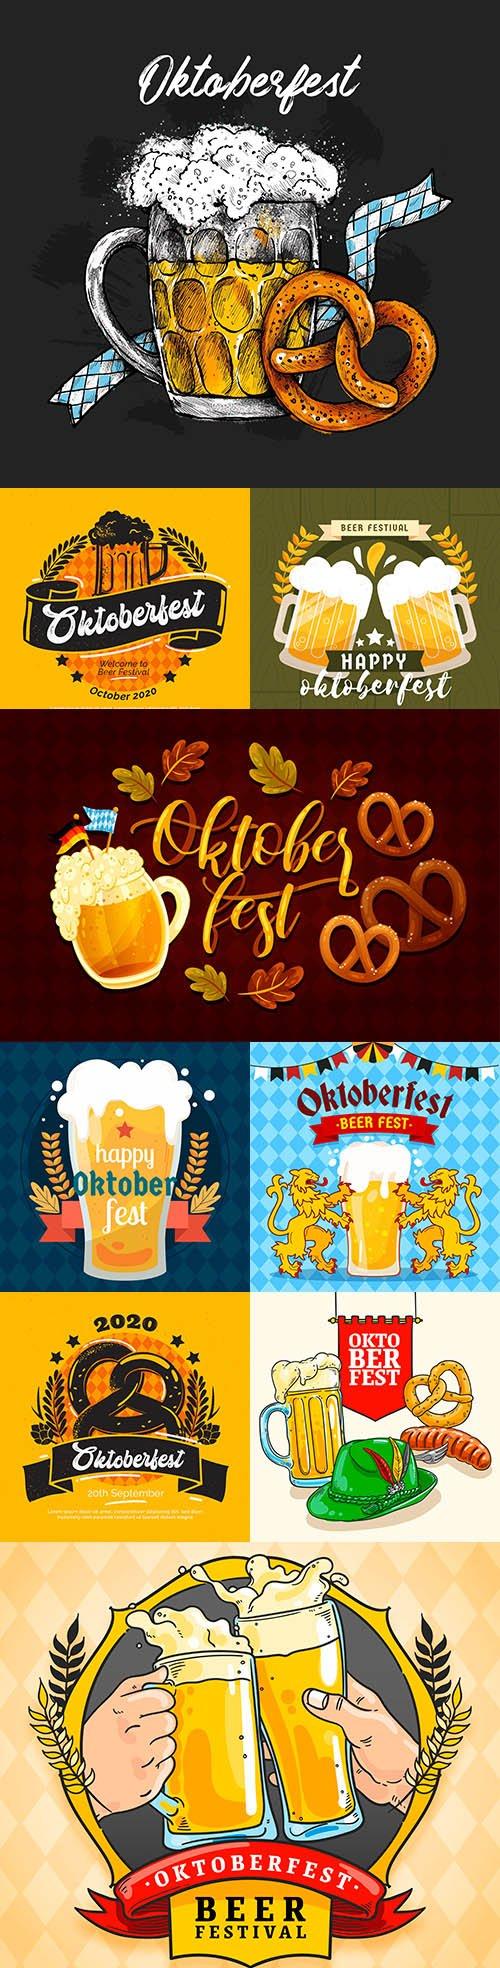 Oktoberfest Beer Festival Flat Design Illustration 5